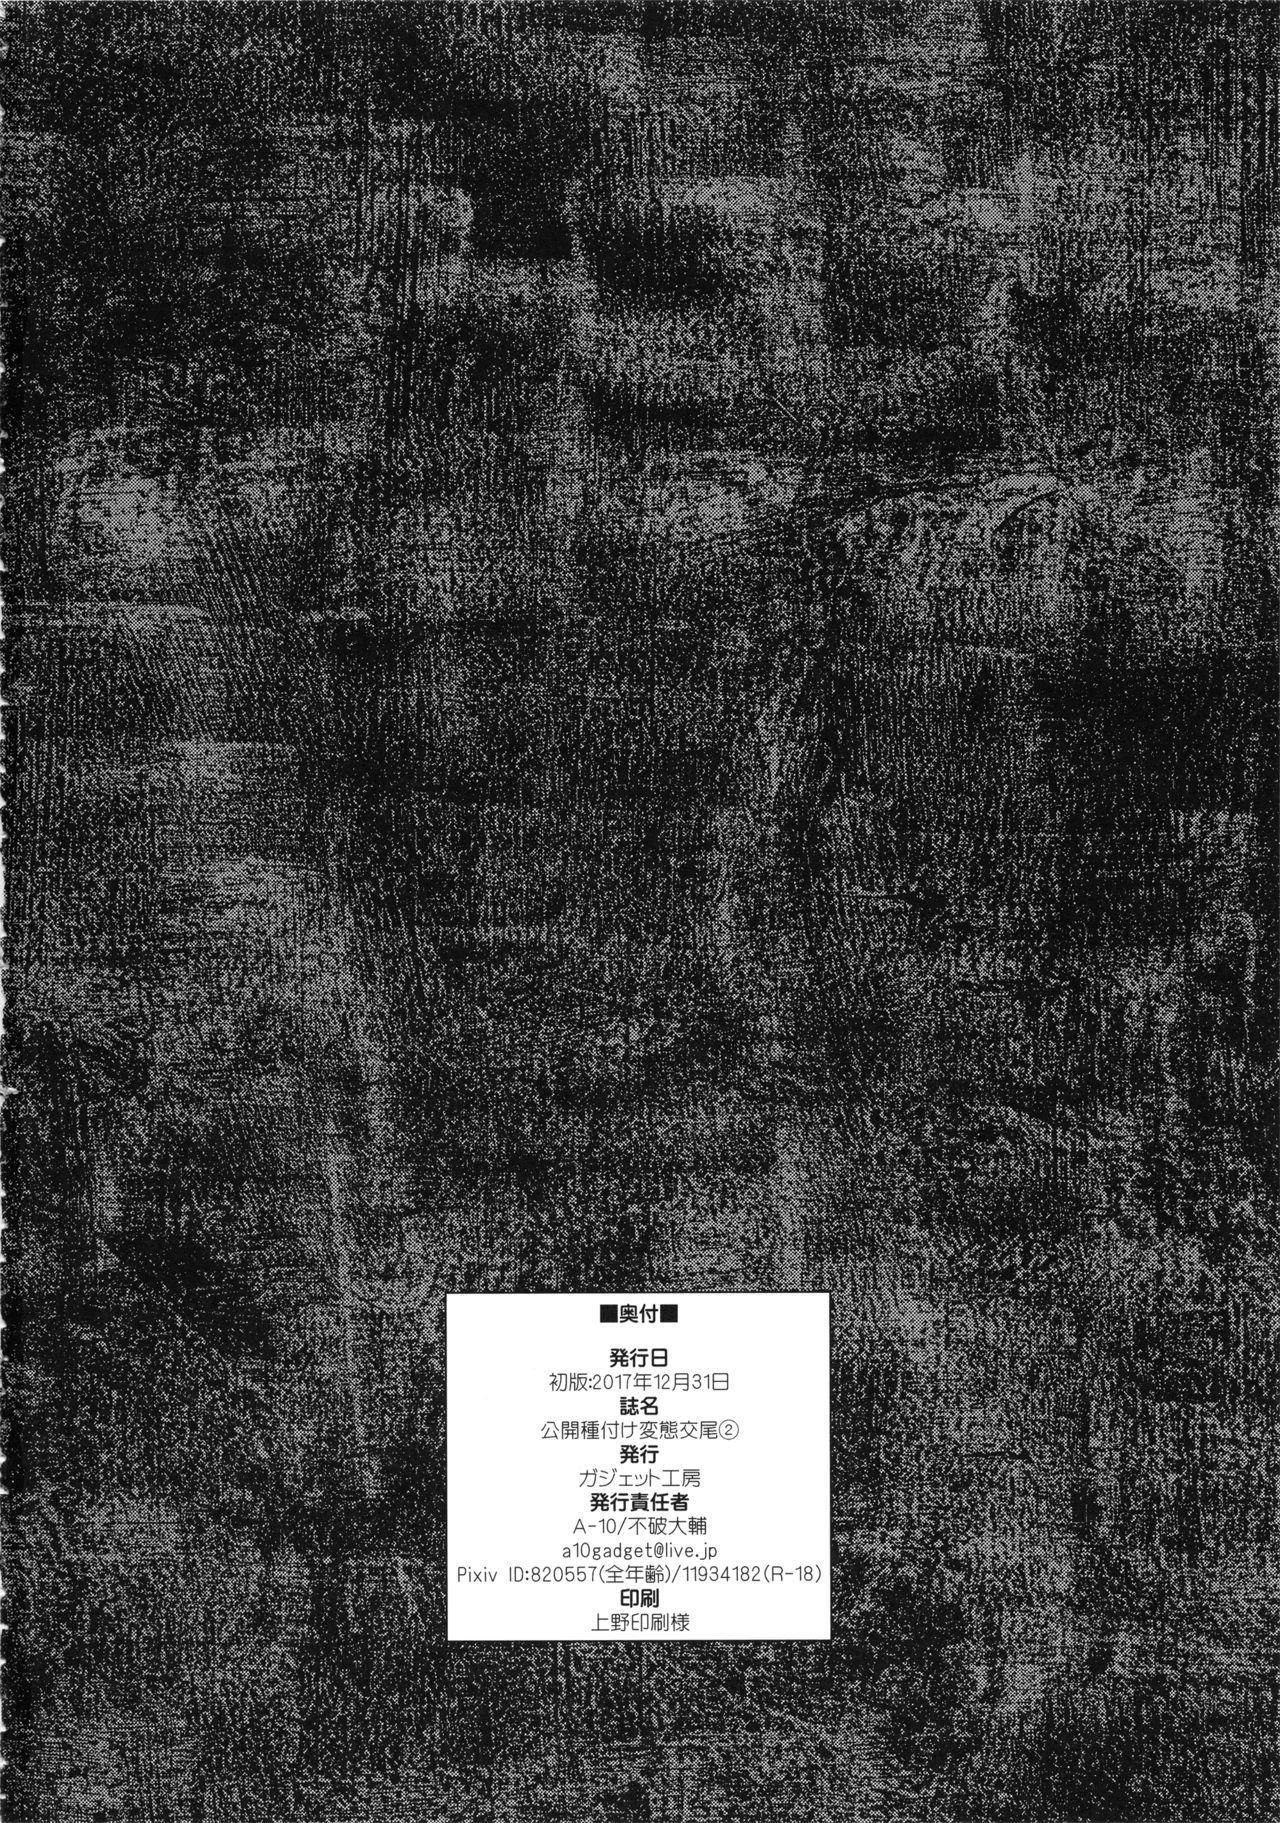 Koukai Tanetsuke Hentai Koubi 2 39